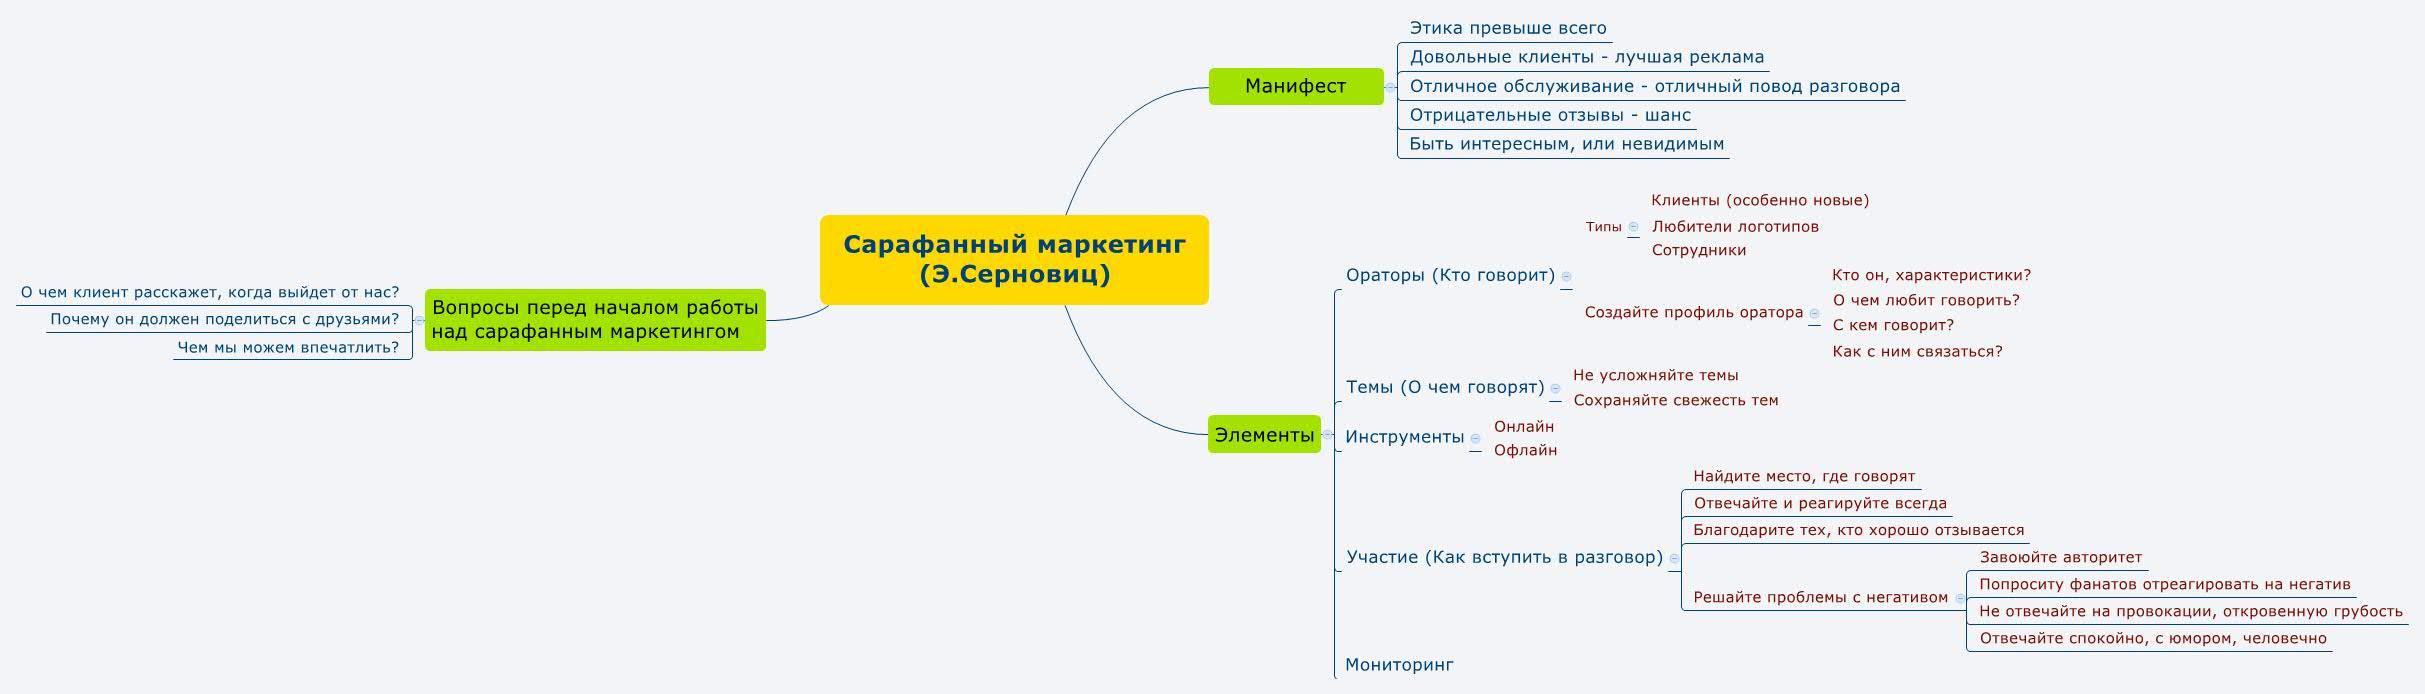 "Серновиц ""Сарафанный маркетинг"""